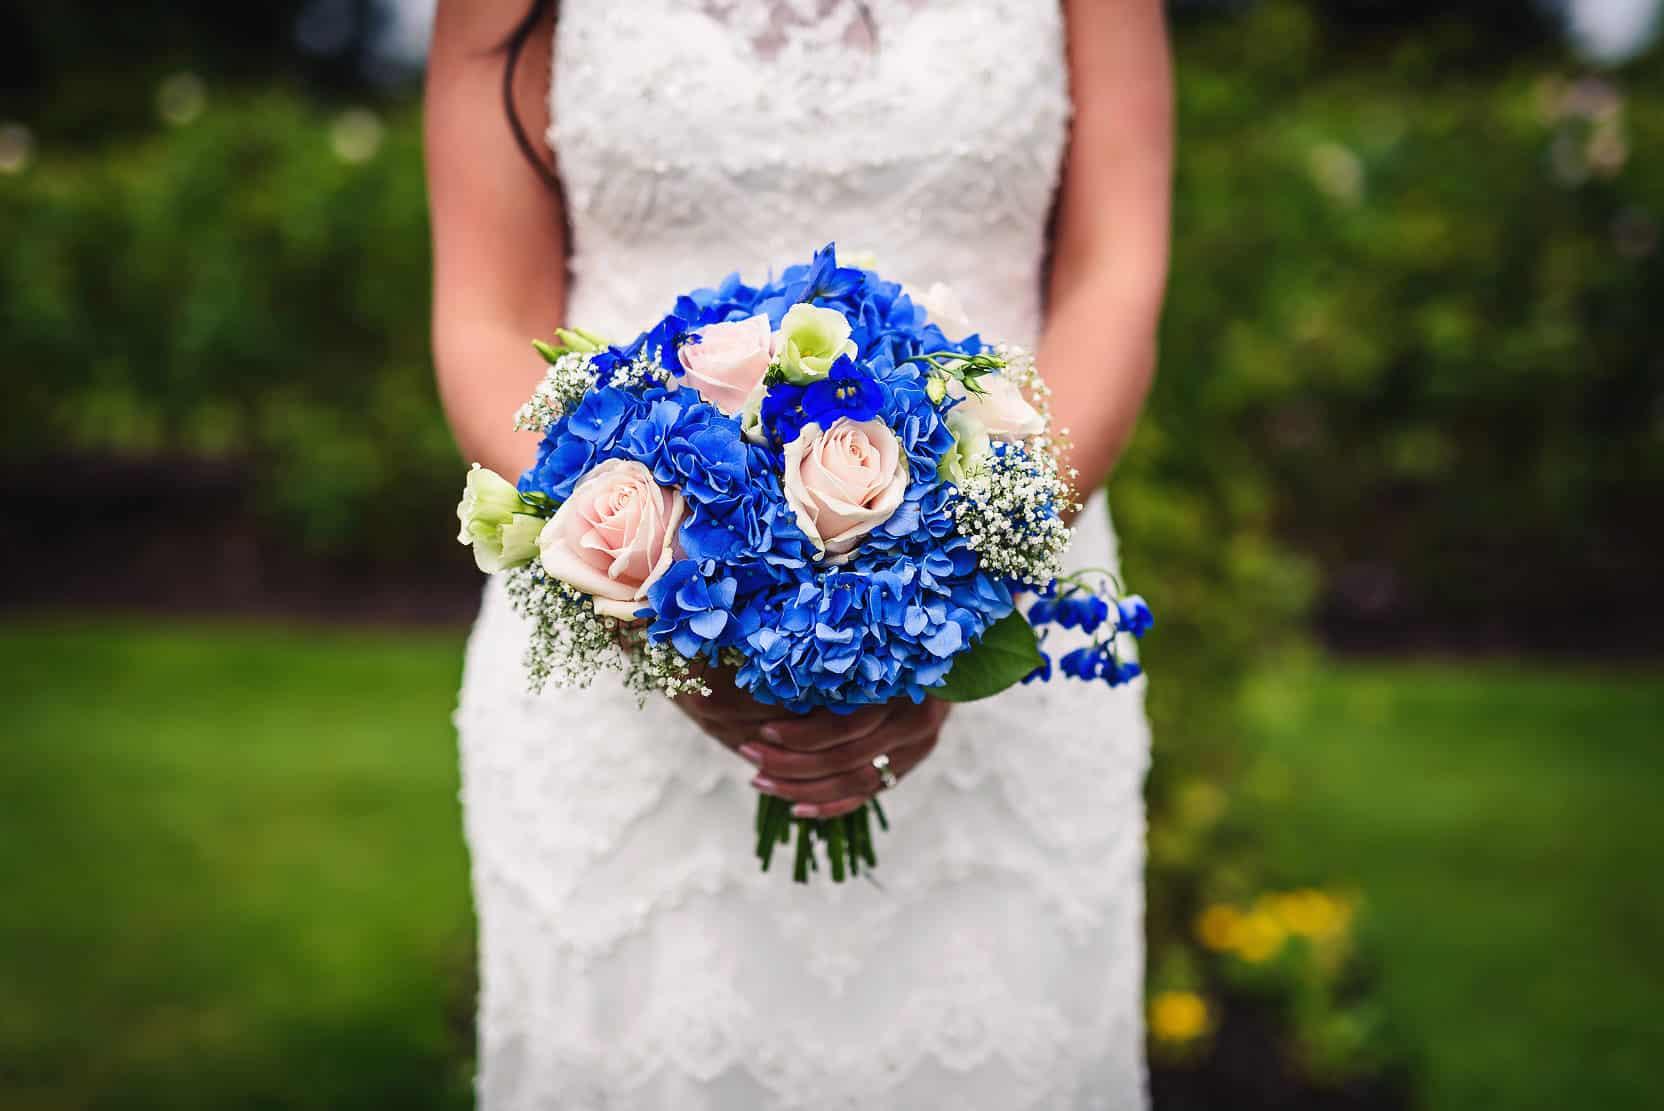 wedding_photography_asia_house_london_ld_justin_bailey_photography_008